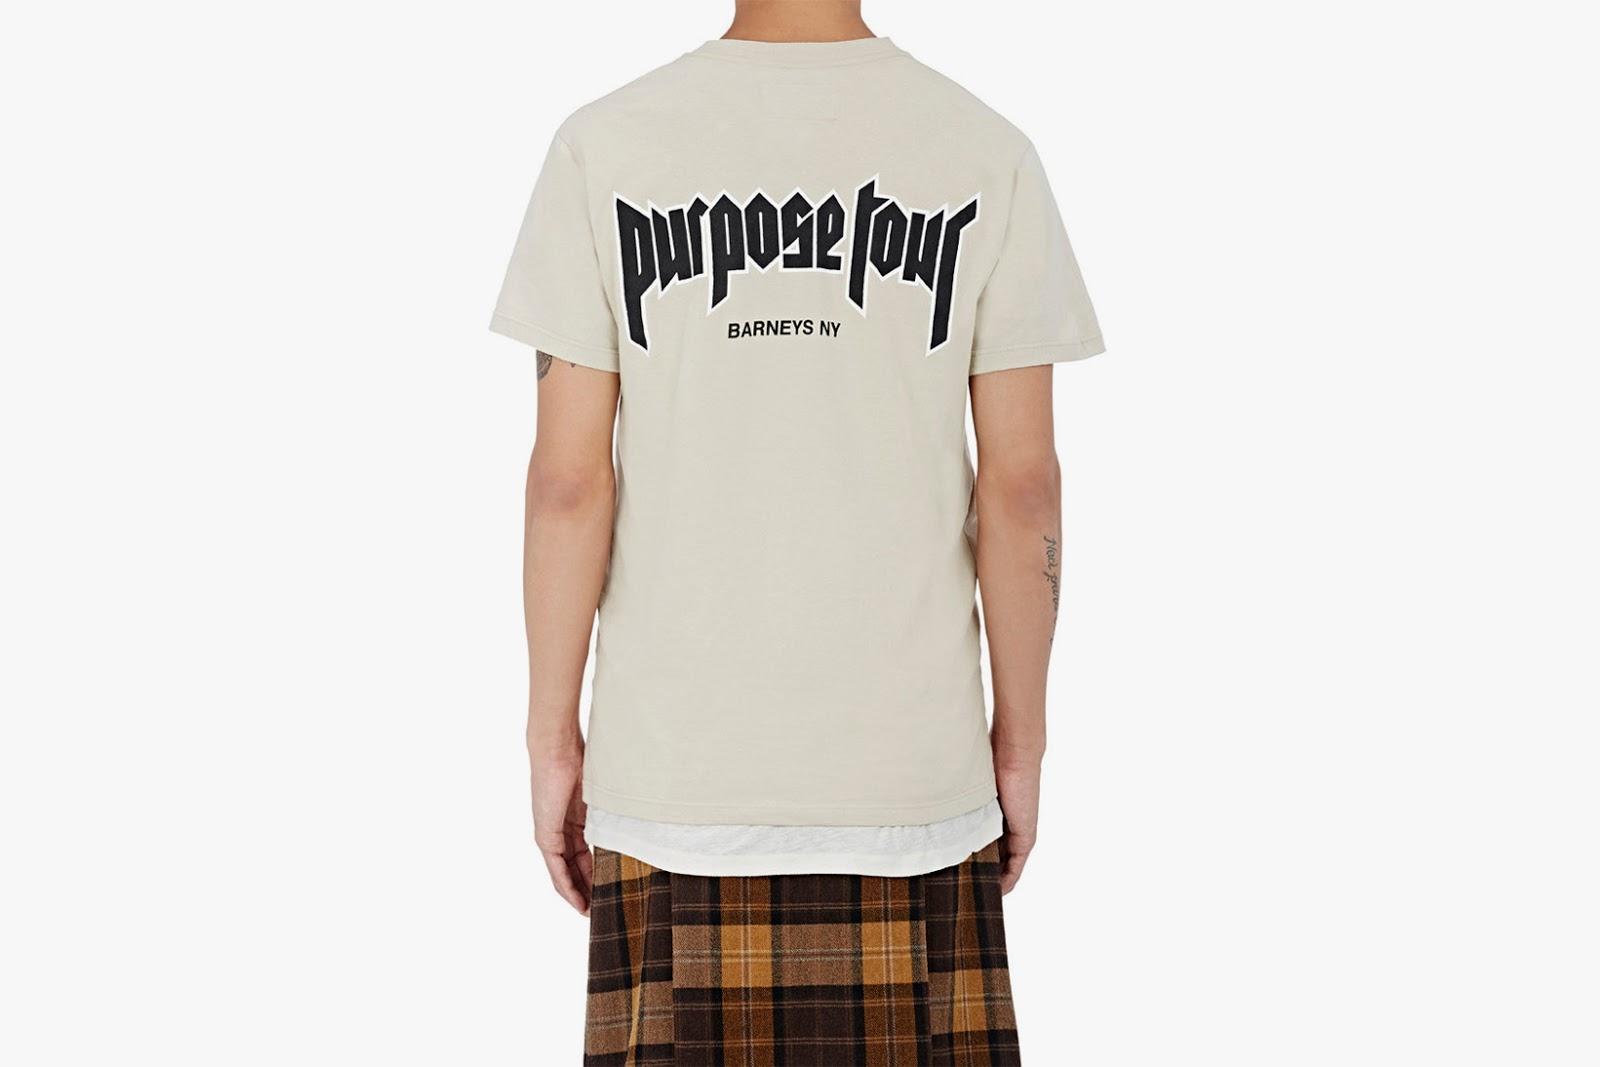 Barneys Purpose Tour Merch